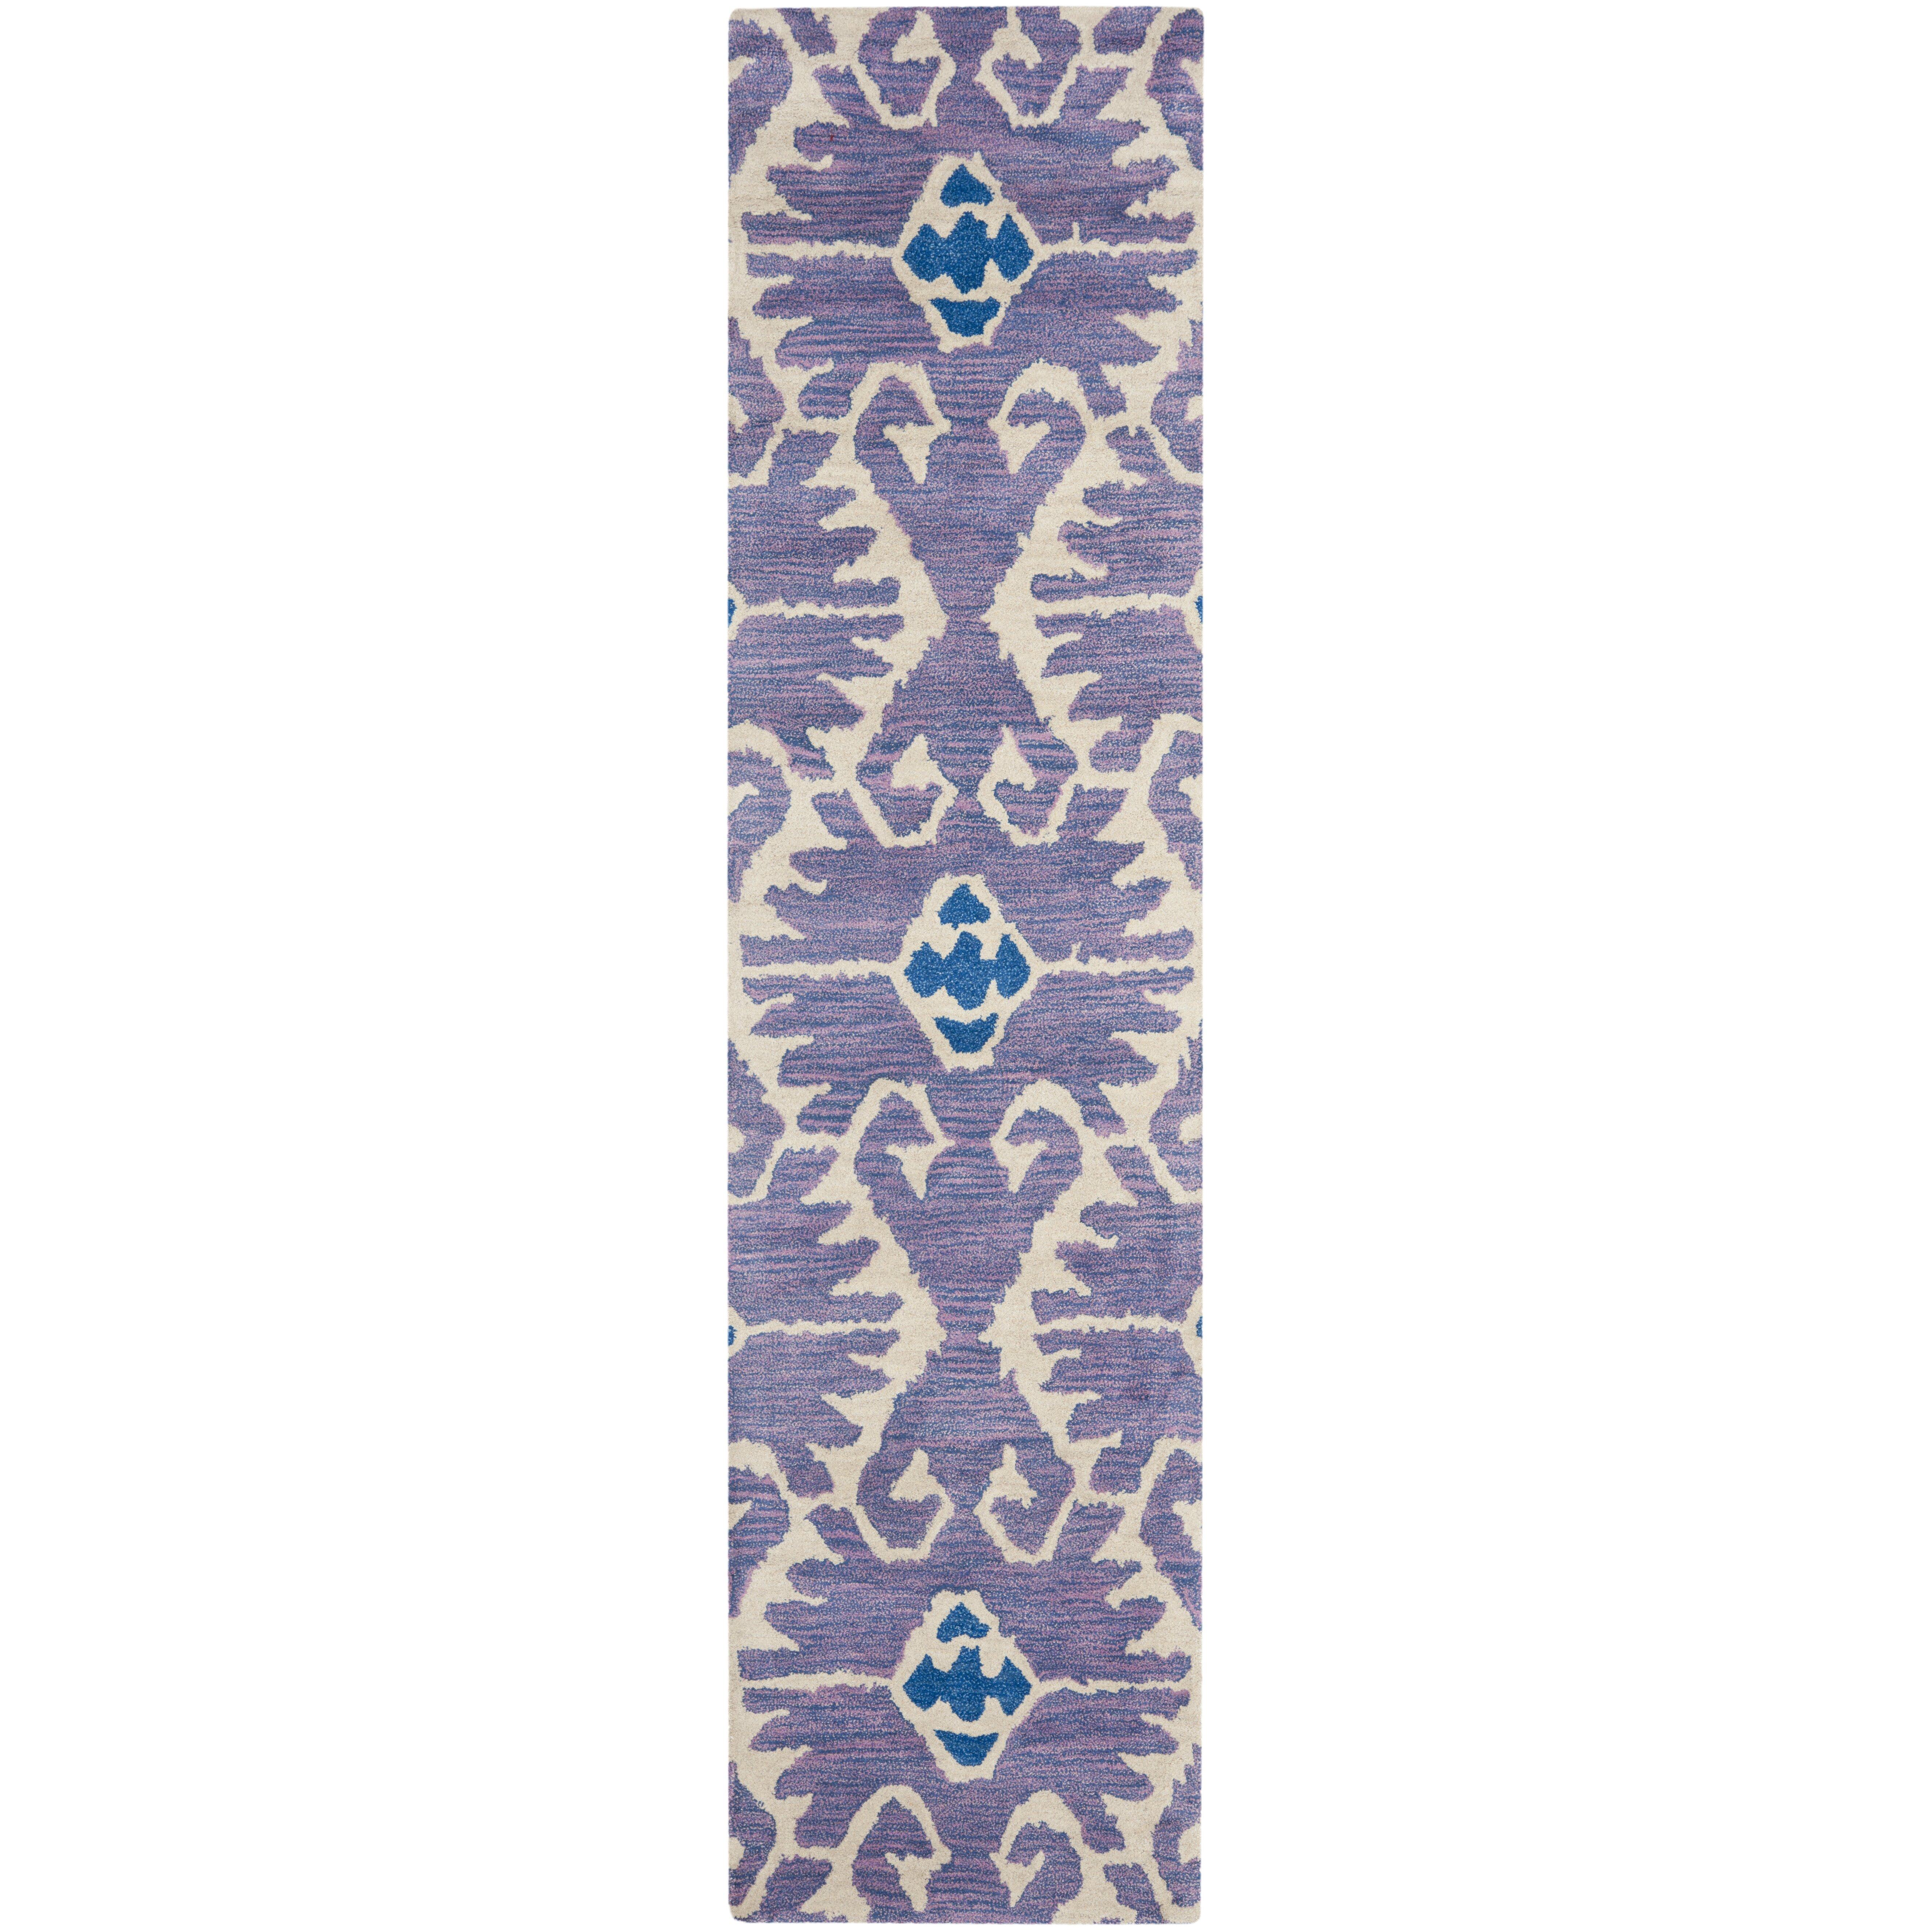 Lavender Rug: Safavieh Wyndham Lavender Area Rug & Reviews